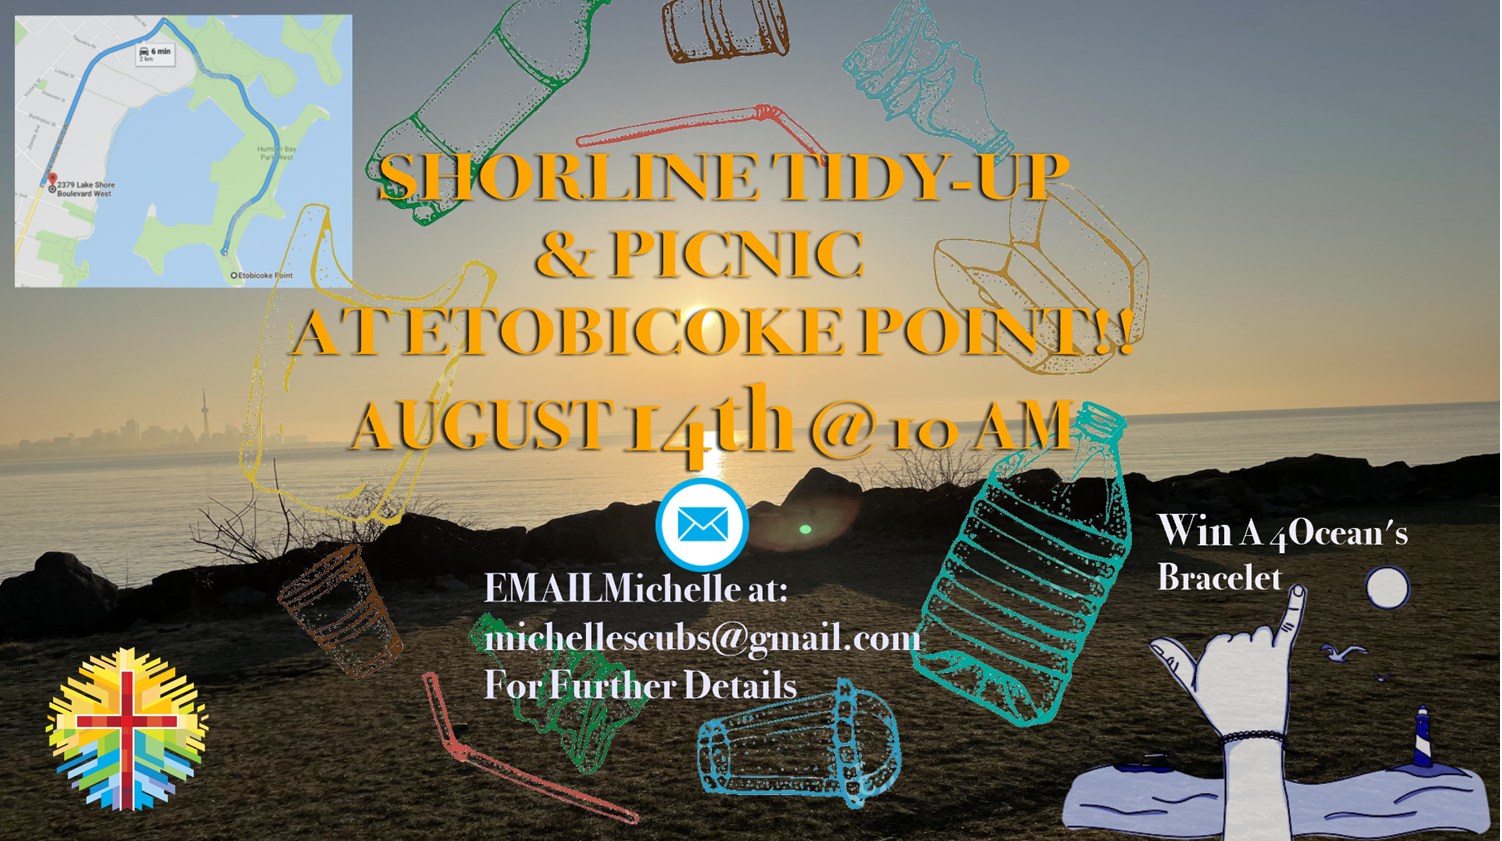 2021-08-14 Saturday Shoreline Tidy-up and Picnic